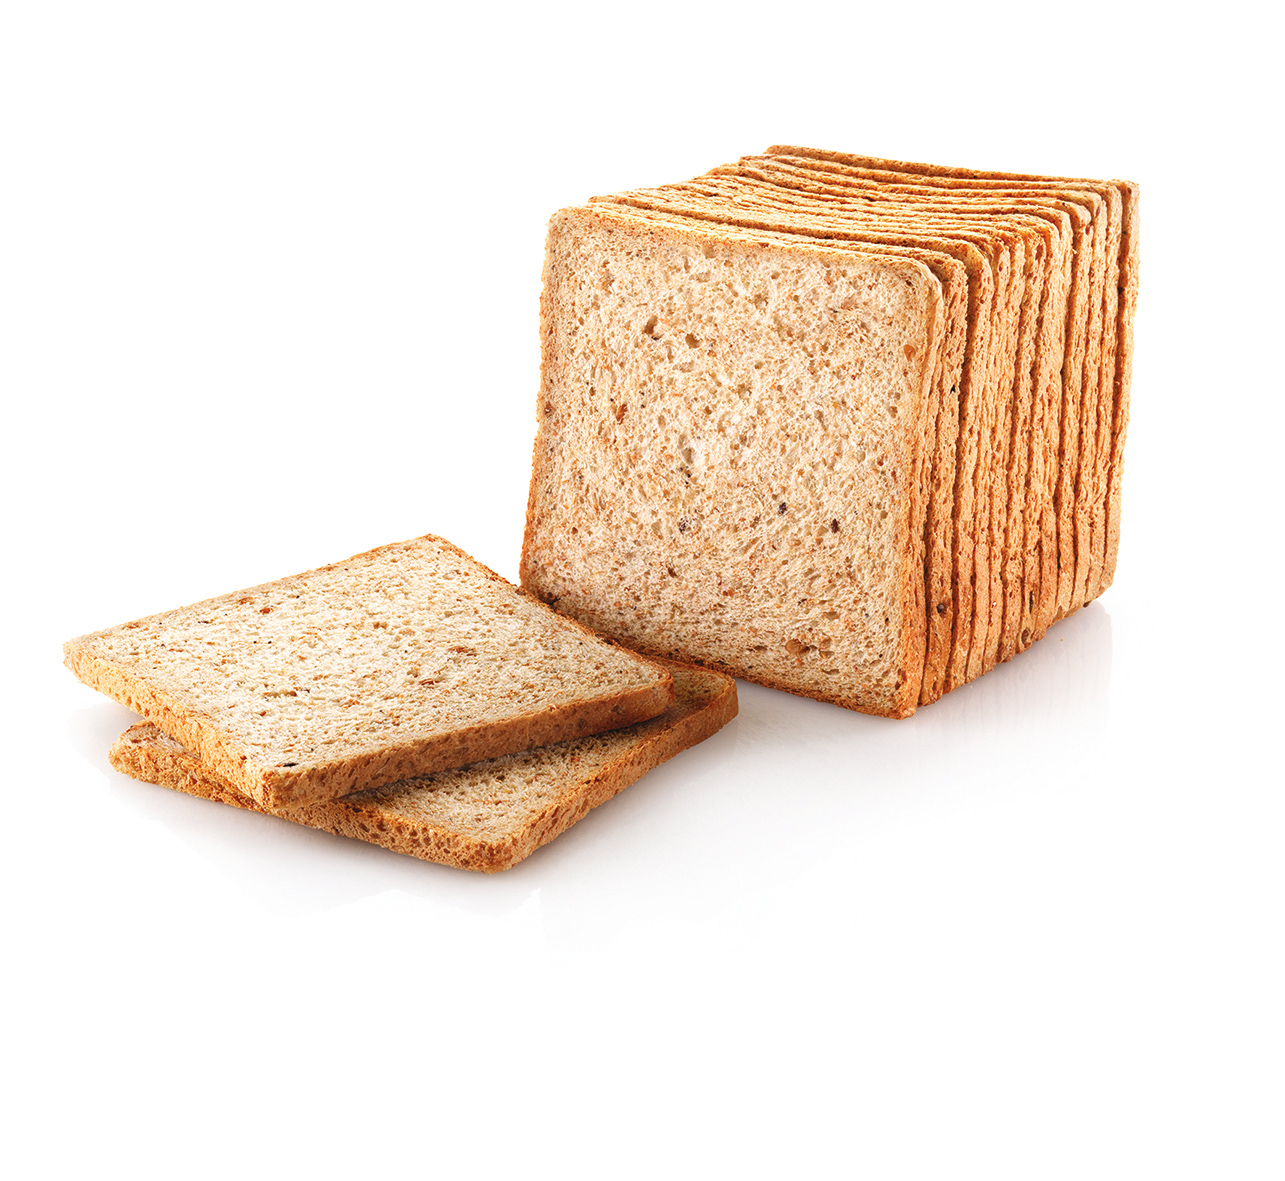 Pane maxi ai cereali – Bassa Risoluzione – PNG a 72 DPI